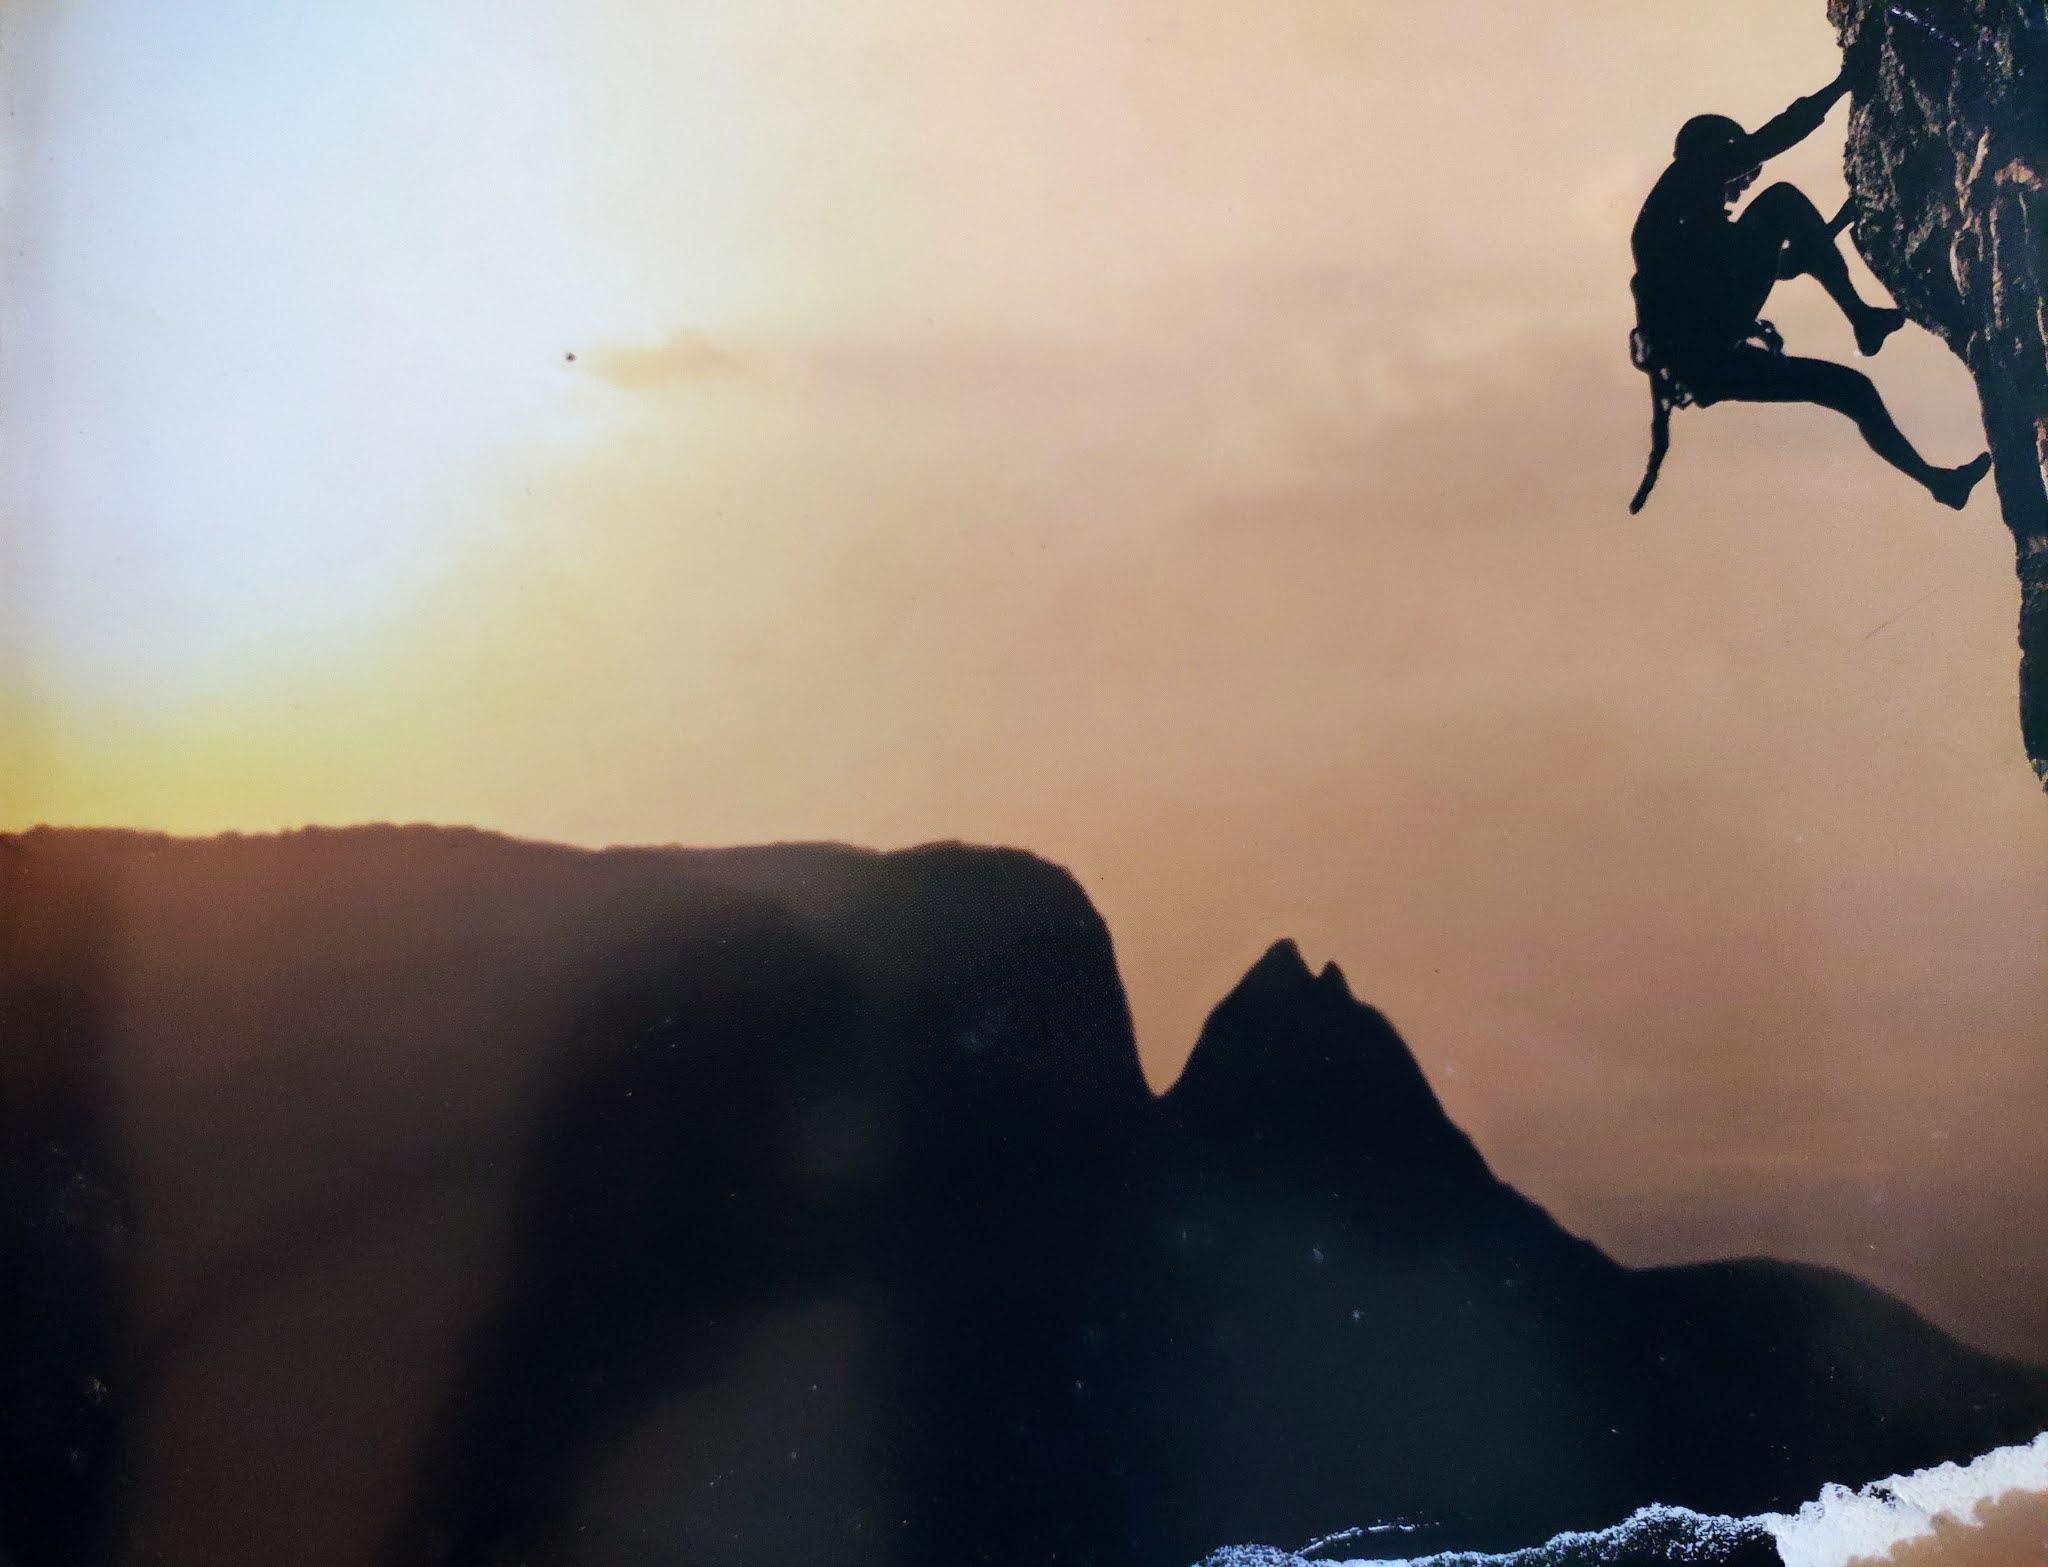 Image contains a man climbing on a rock